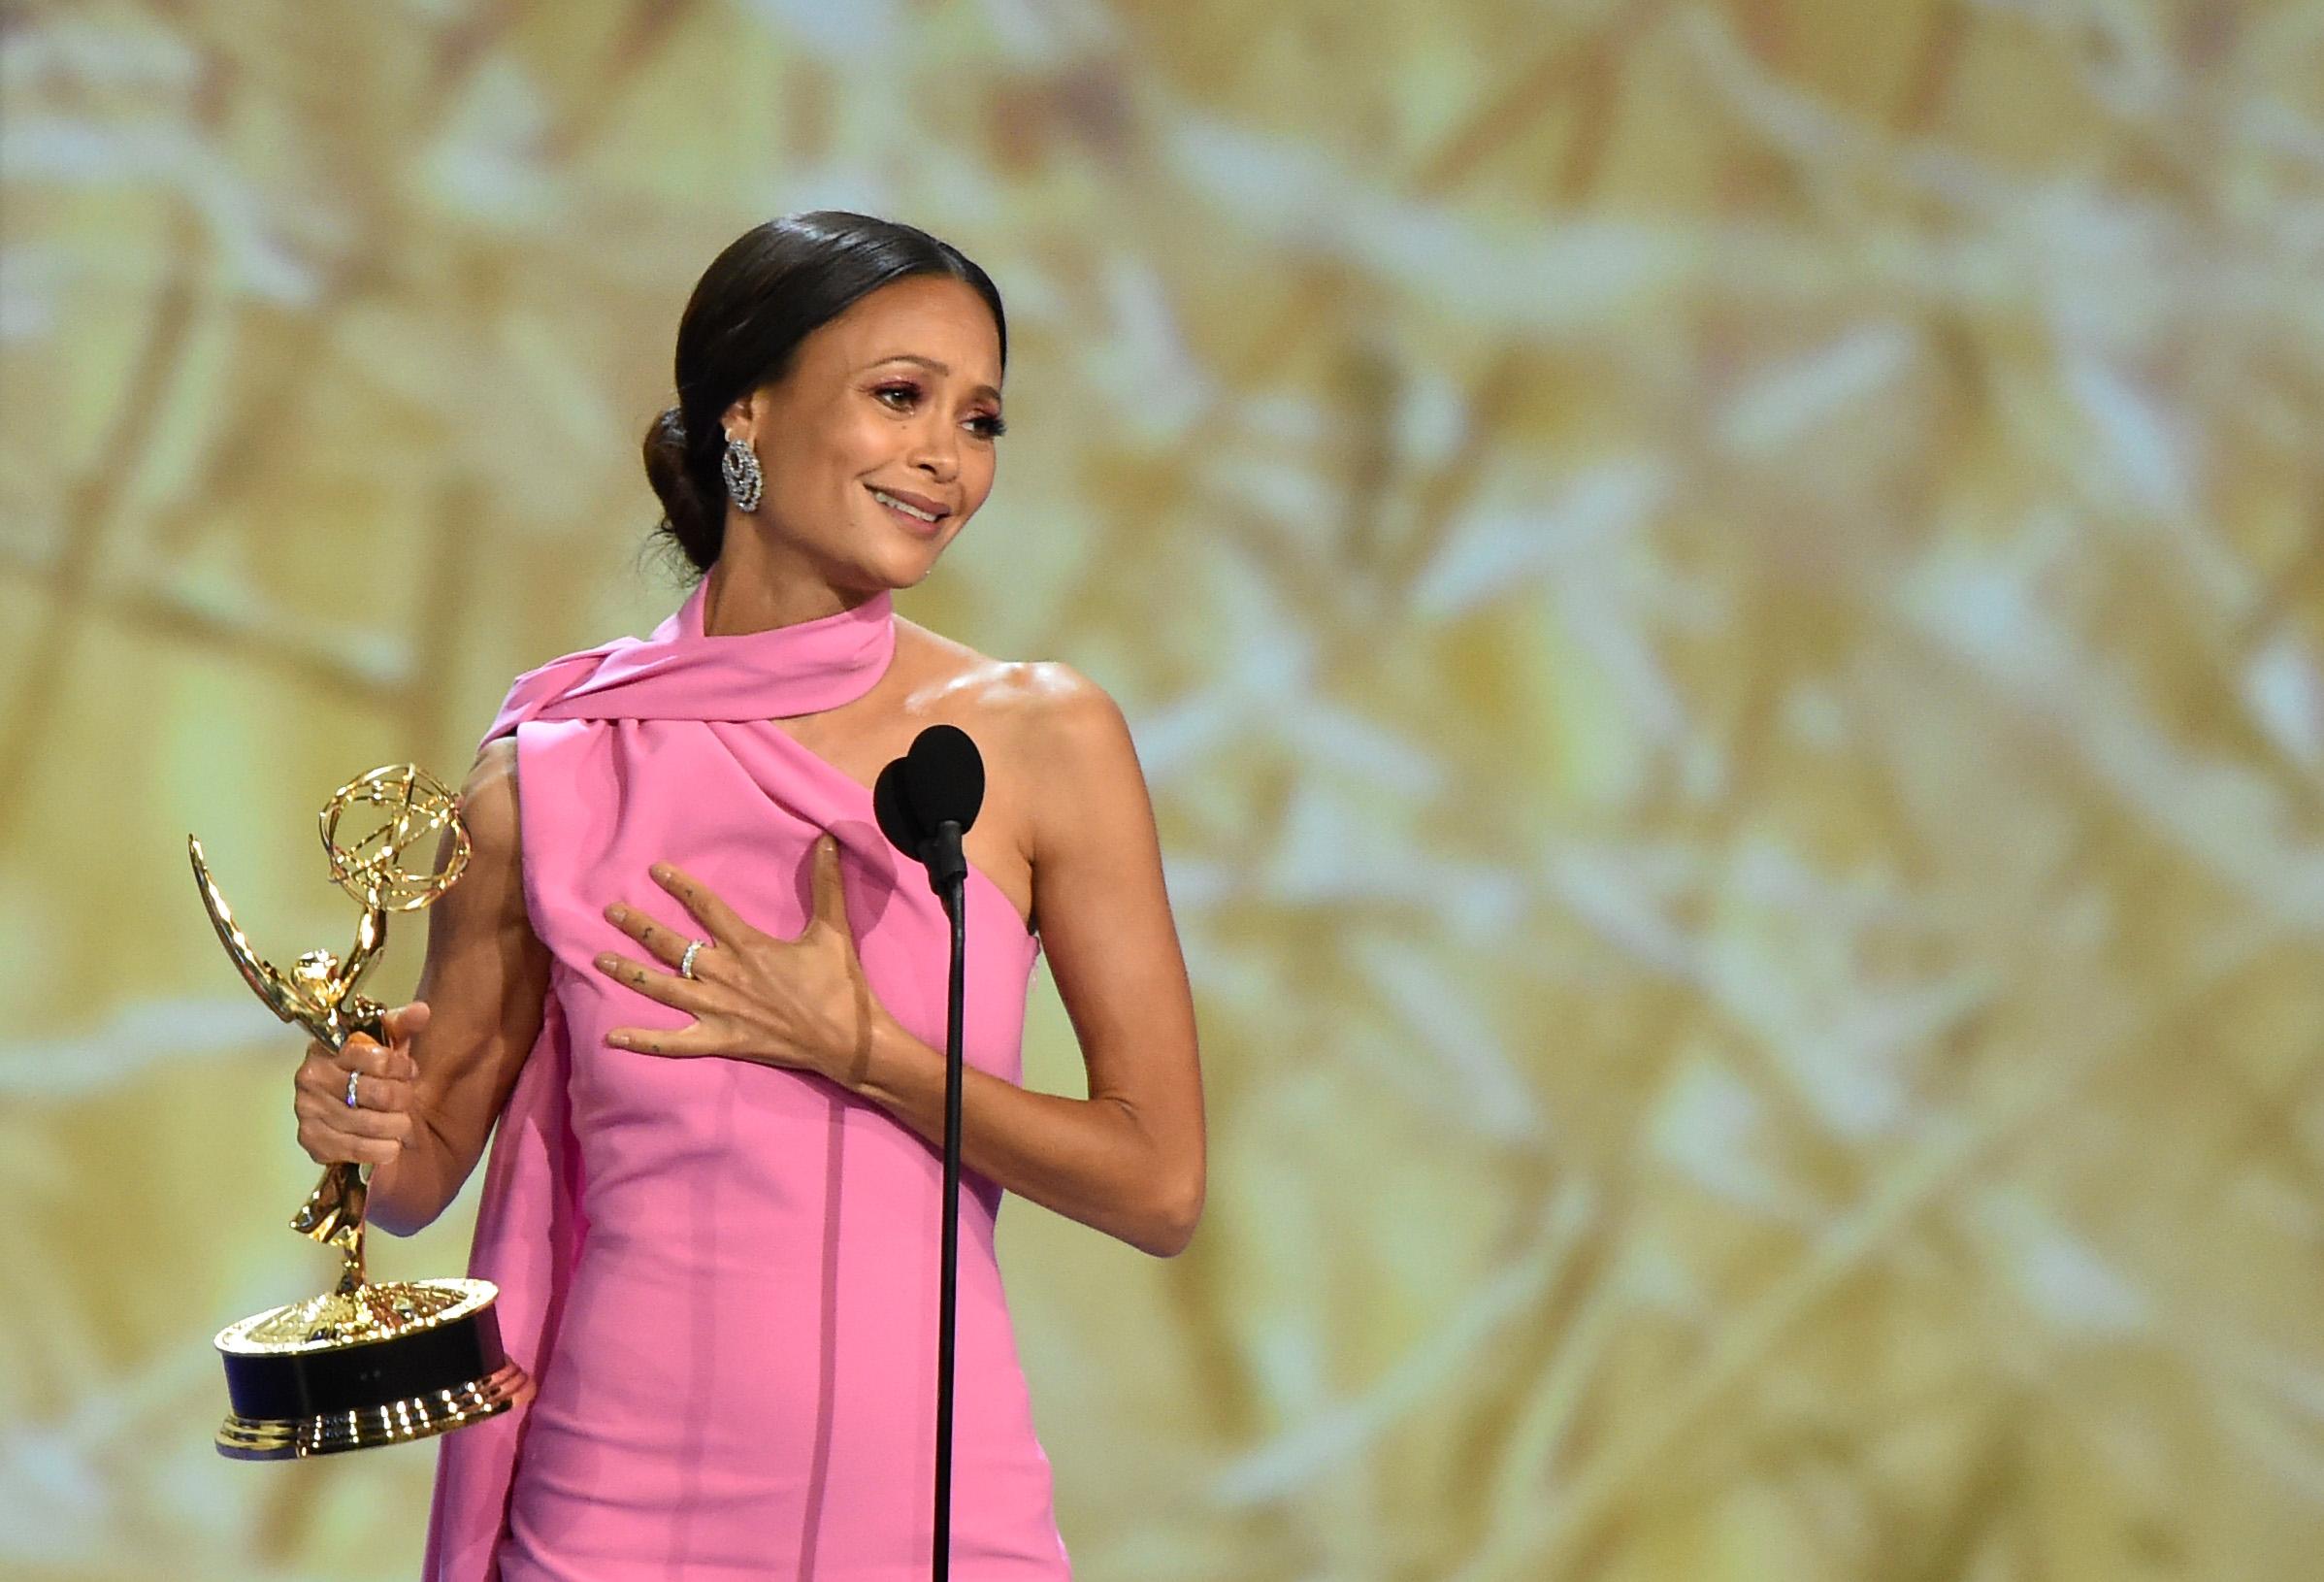 70th Primetime Emmy Awards, Show, Los Angeles, USA - 17 Sep 2018